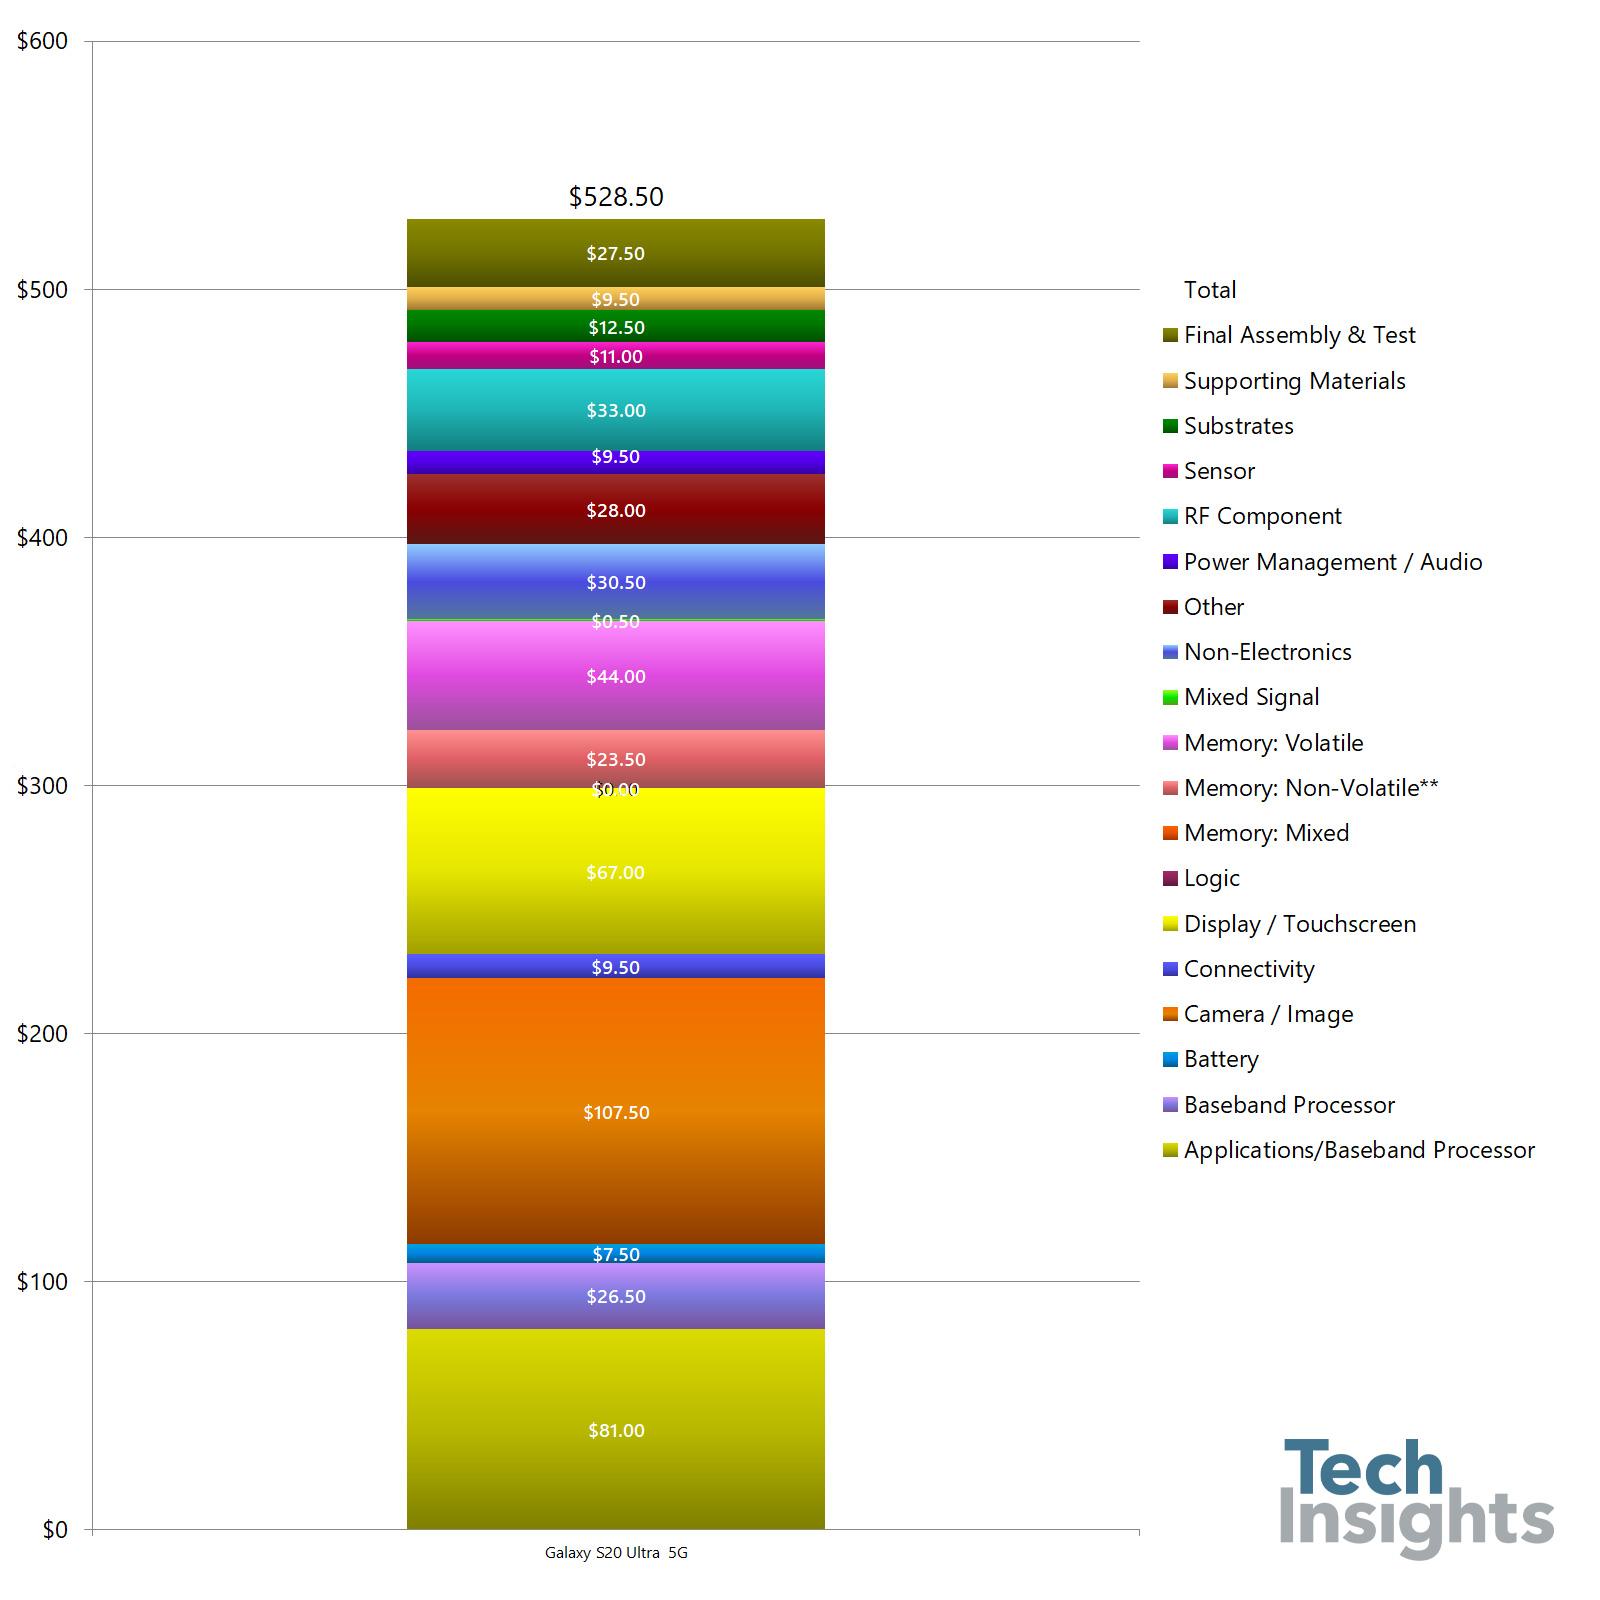 Samsung Galaxy S20 Ultra 5G Costing